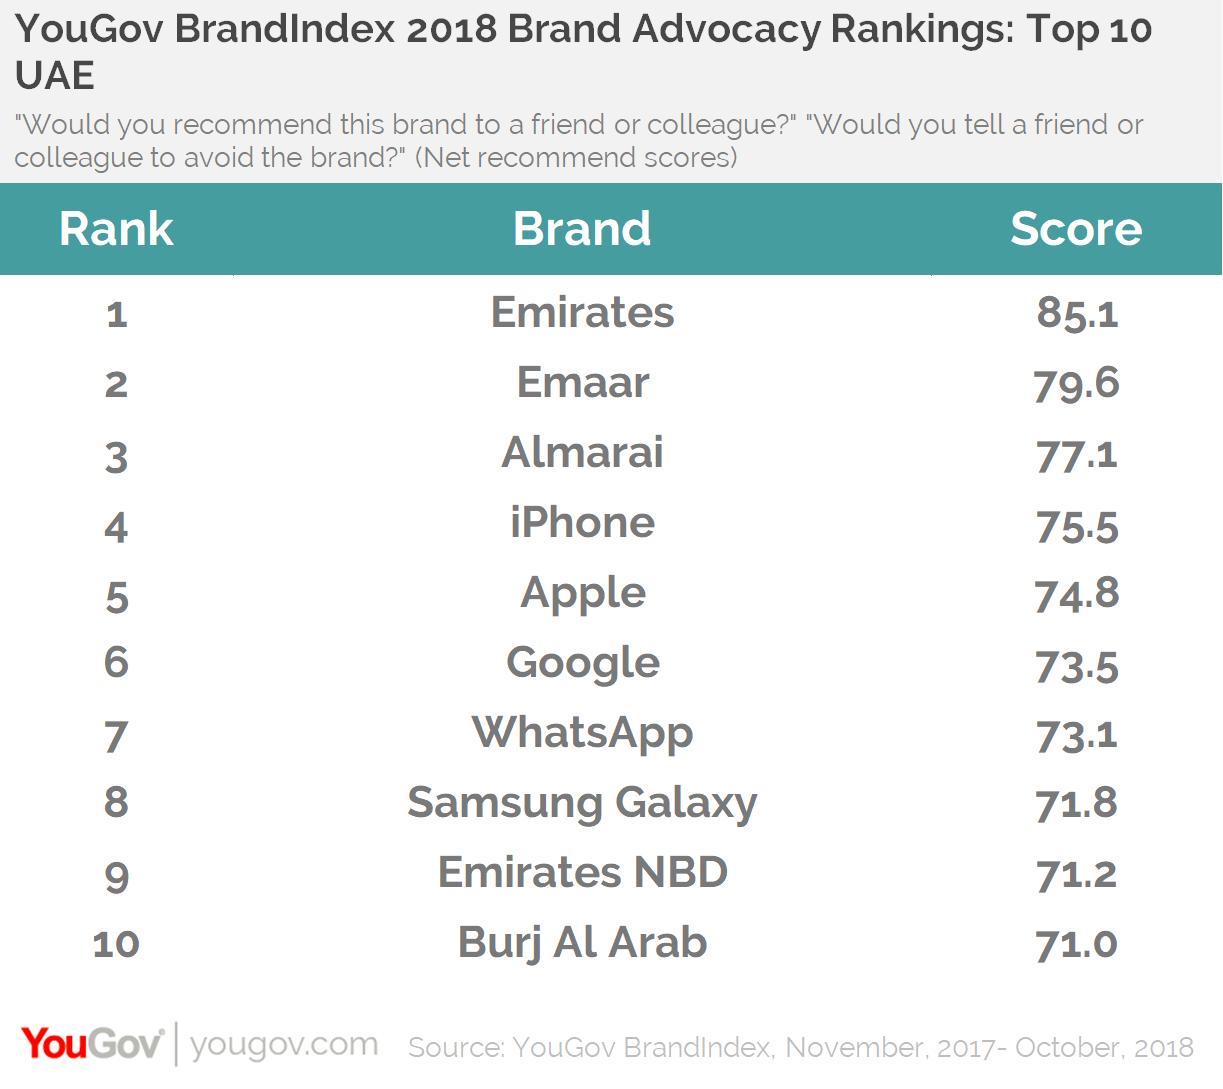 YouGov BrandIndex 2018 Brand Advocacy Rankings: Top 10 UAE